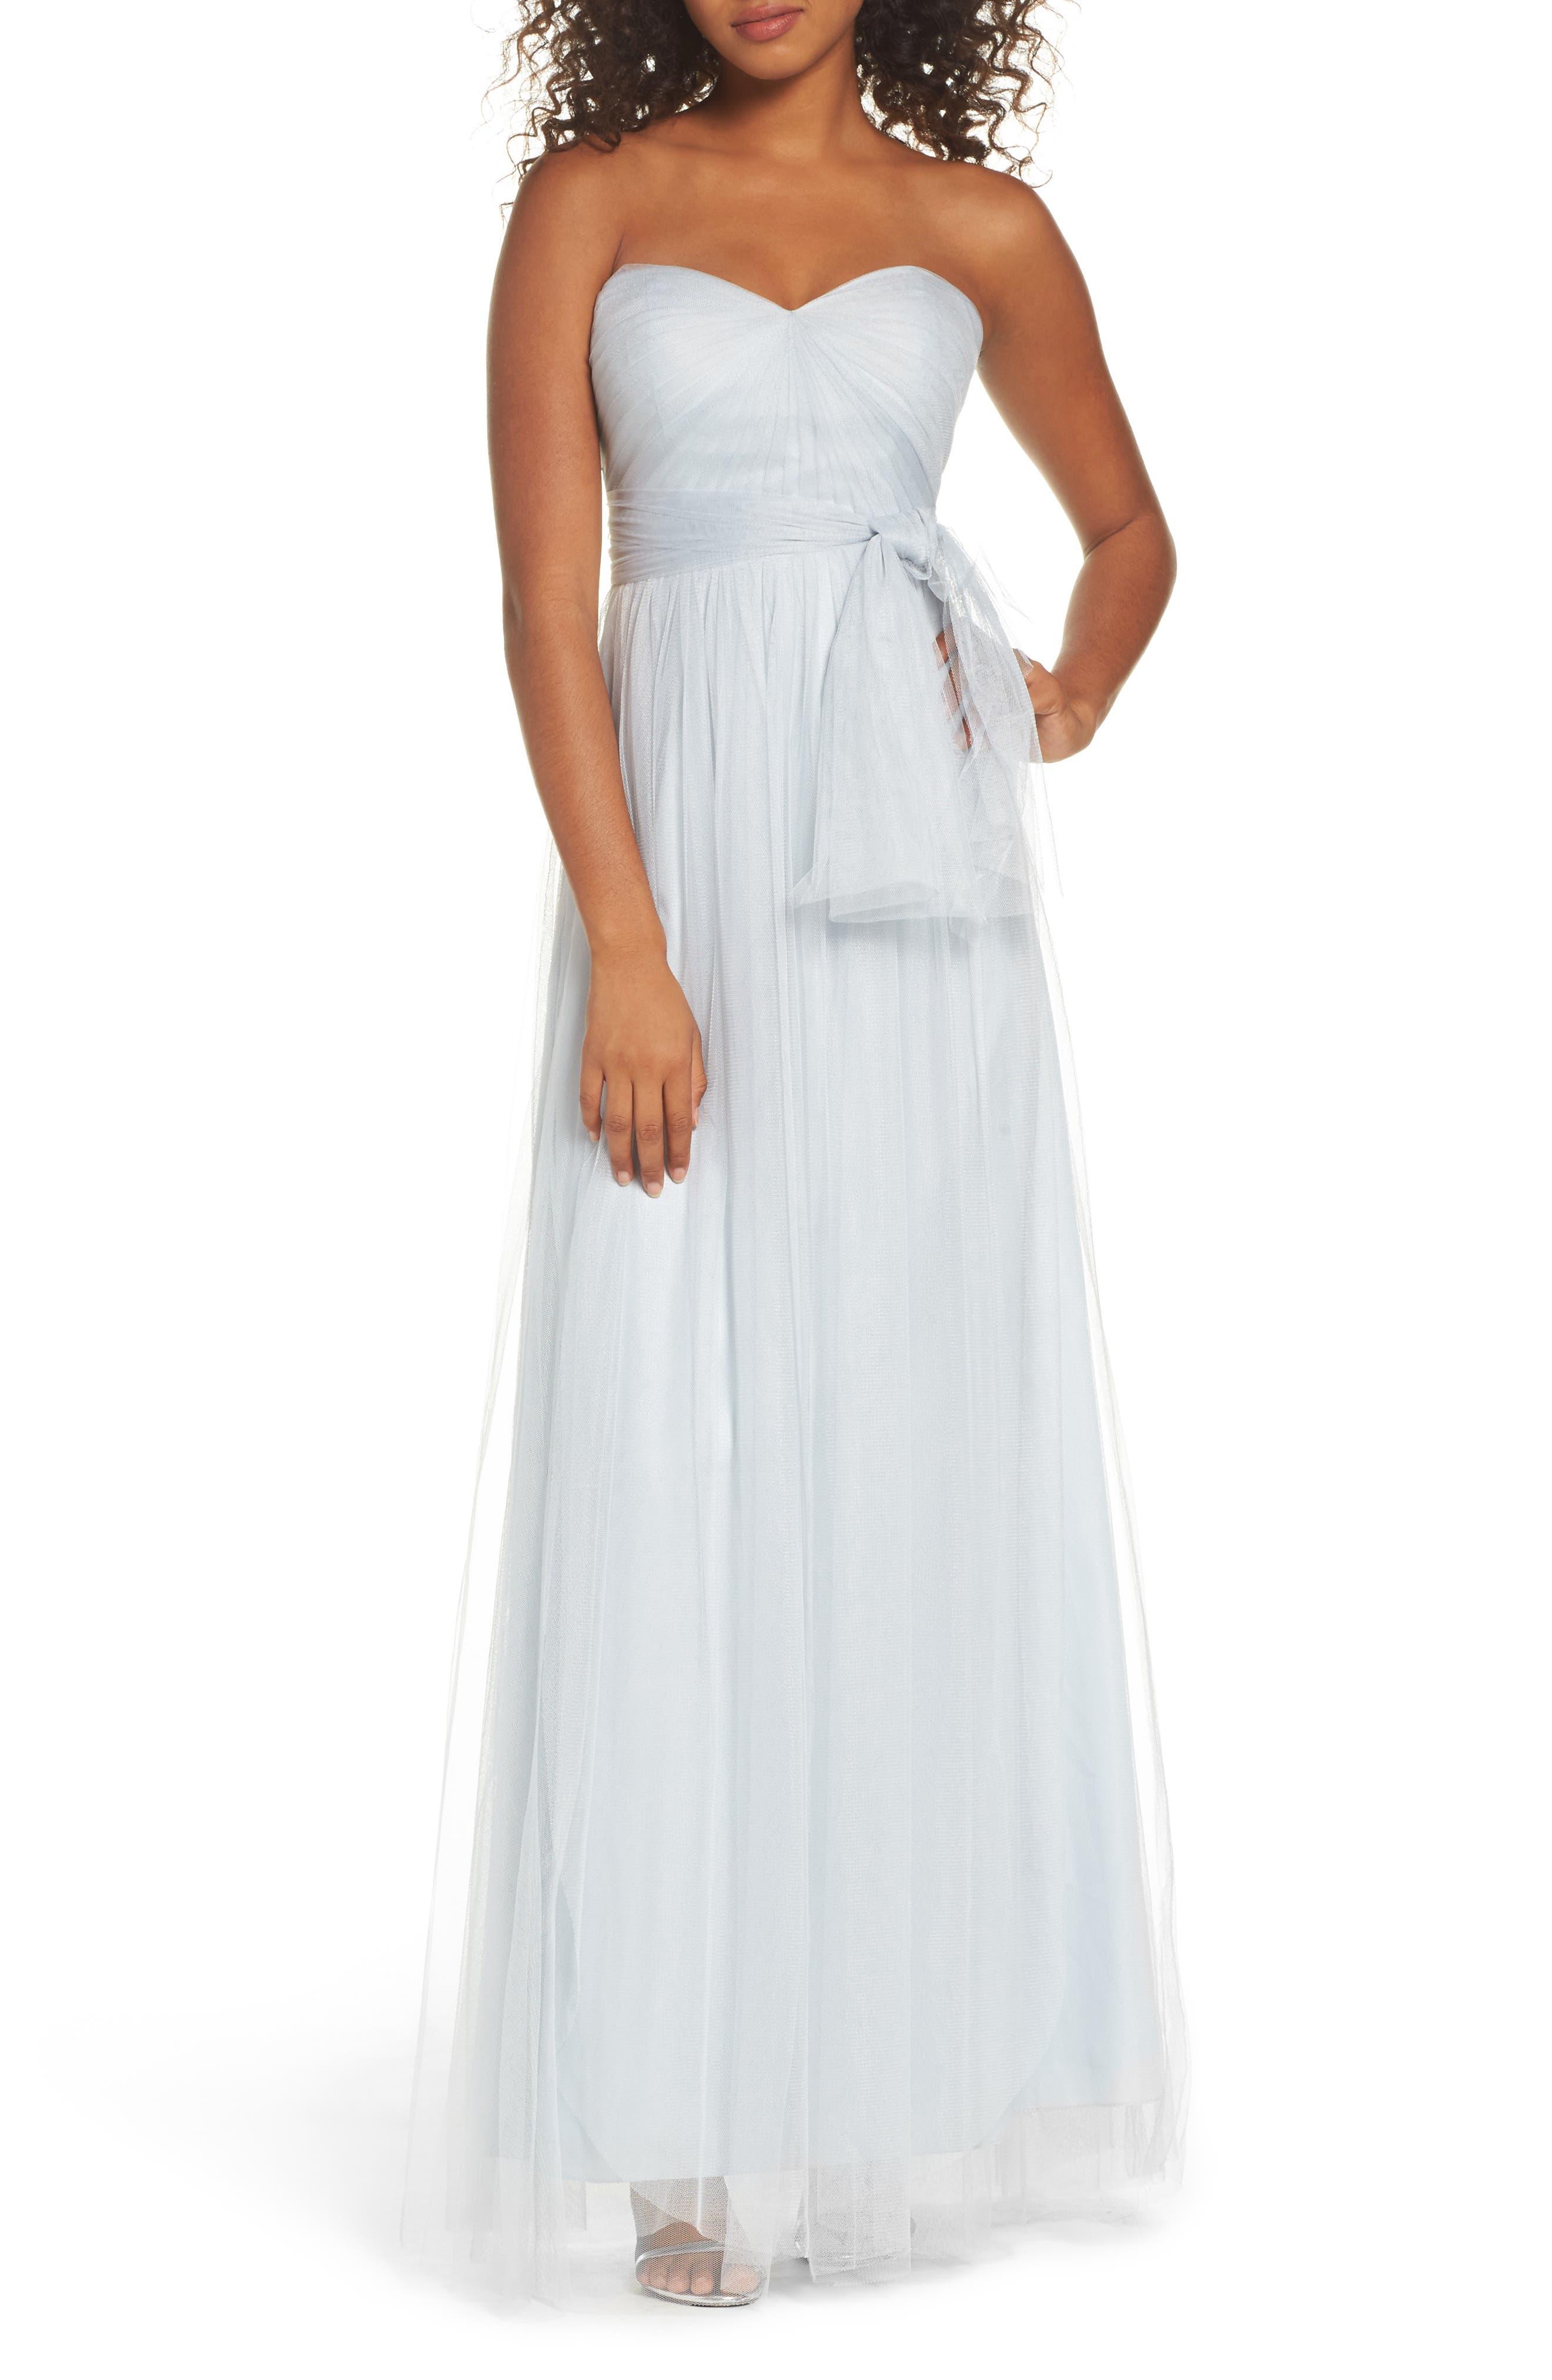 Main Image - Jenny Yoo Annabelle Convertible Tulle Column Dress